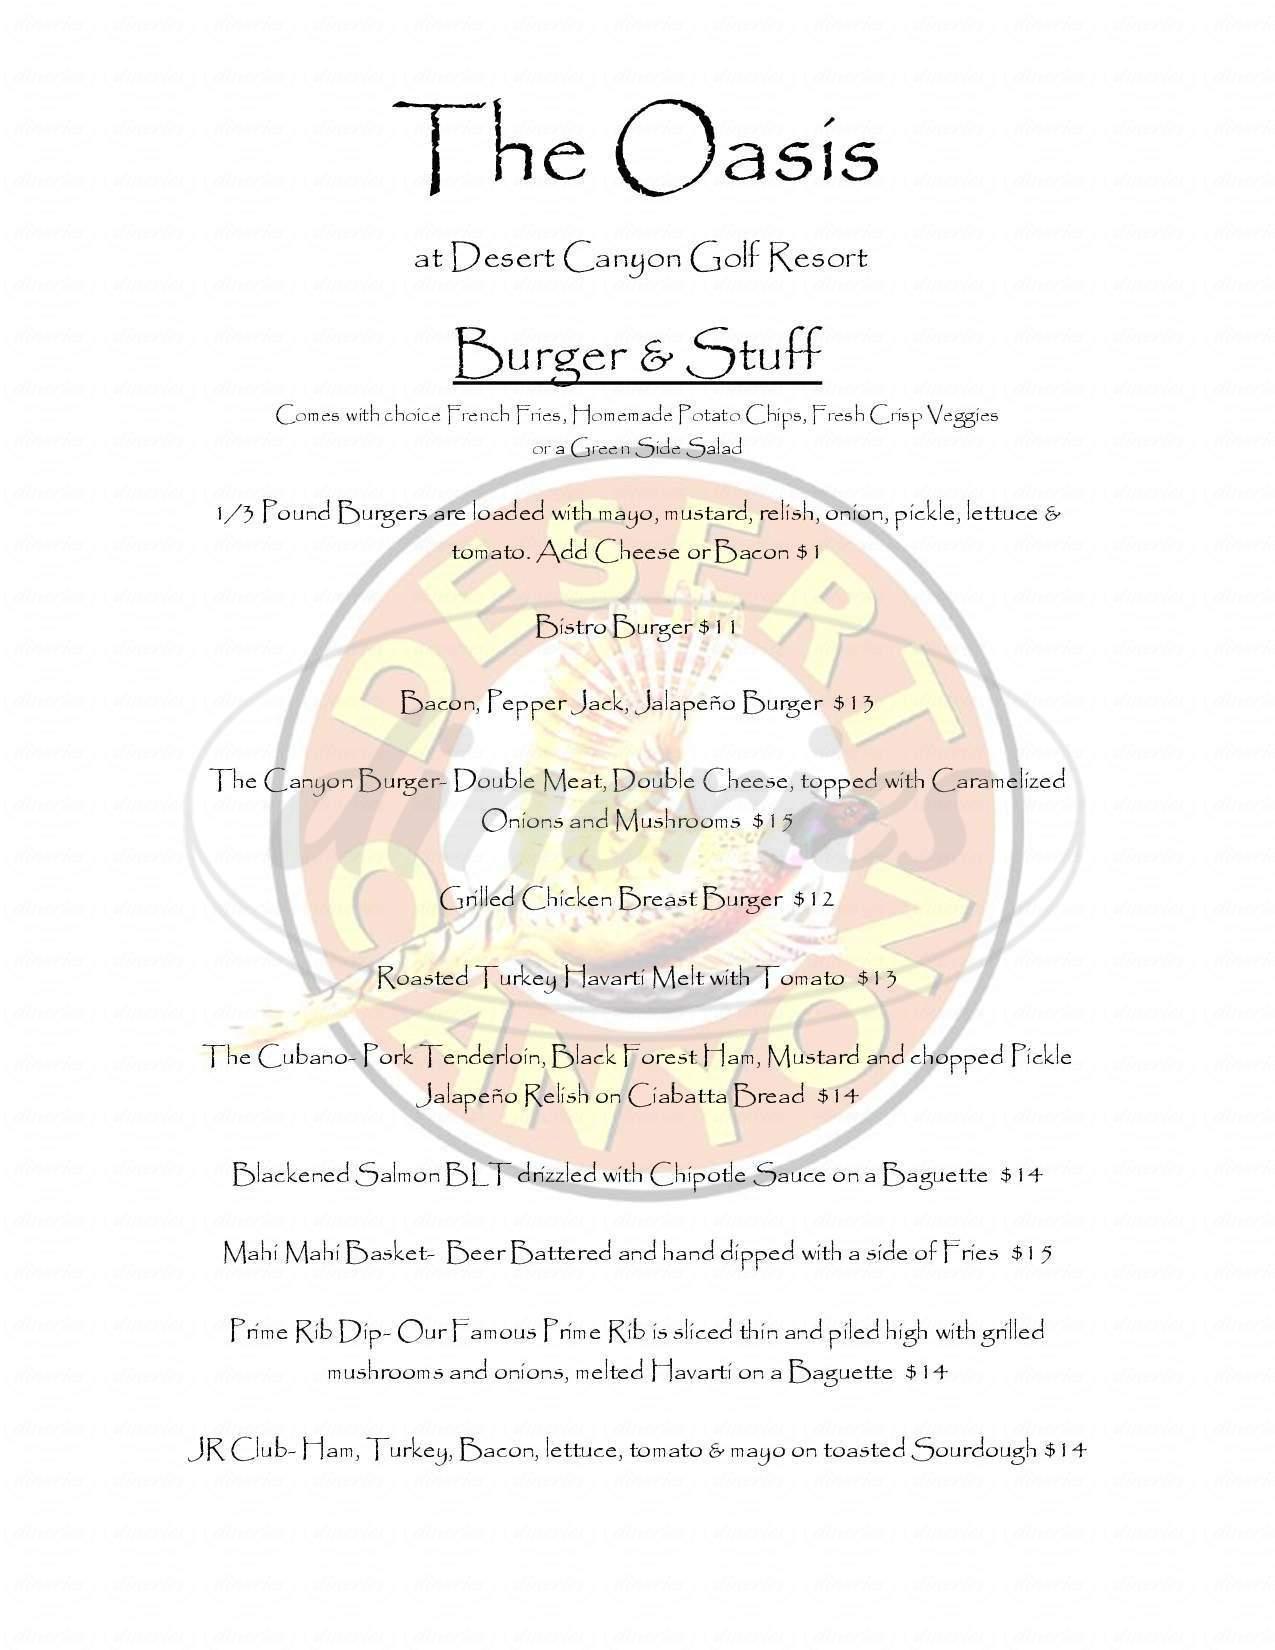 menu for Desert Canyon Golf Resort